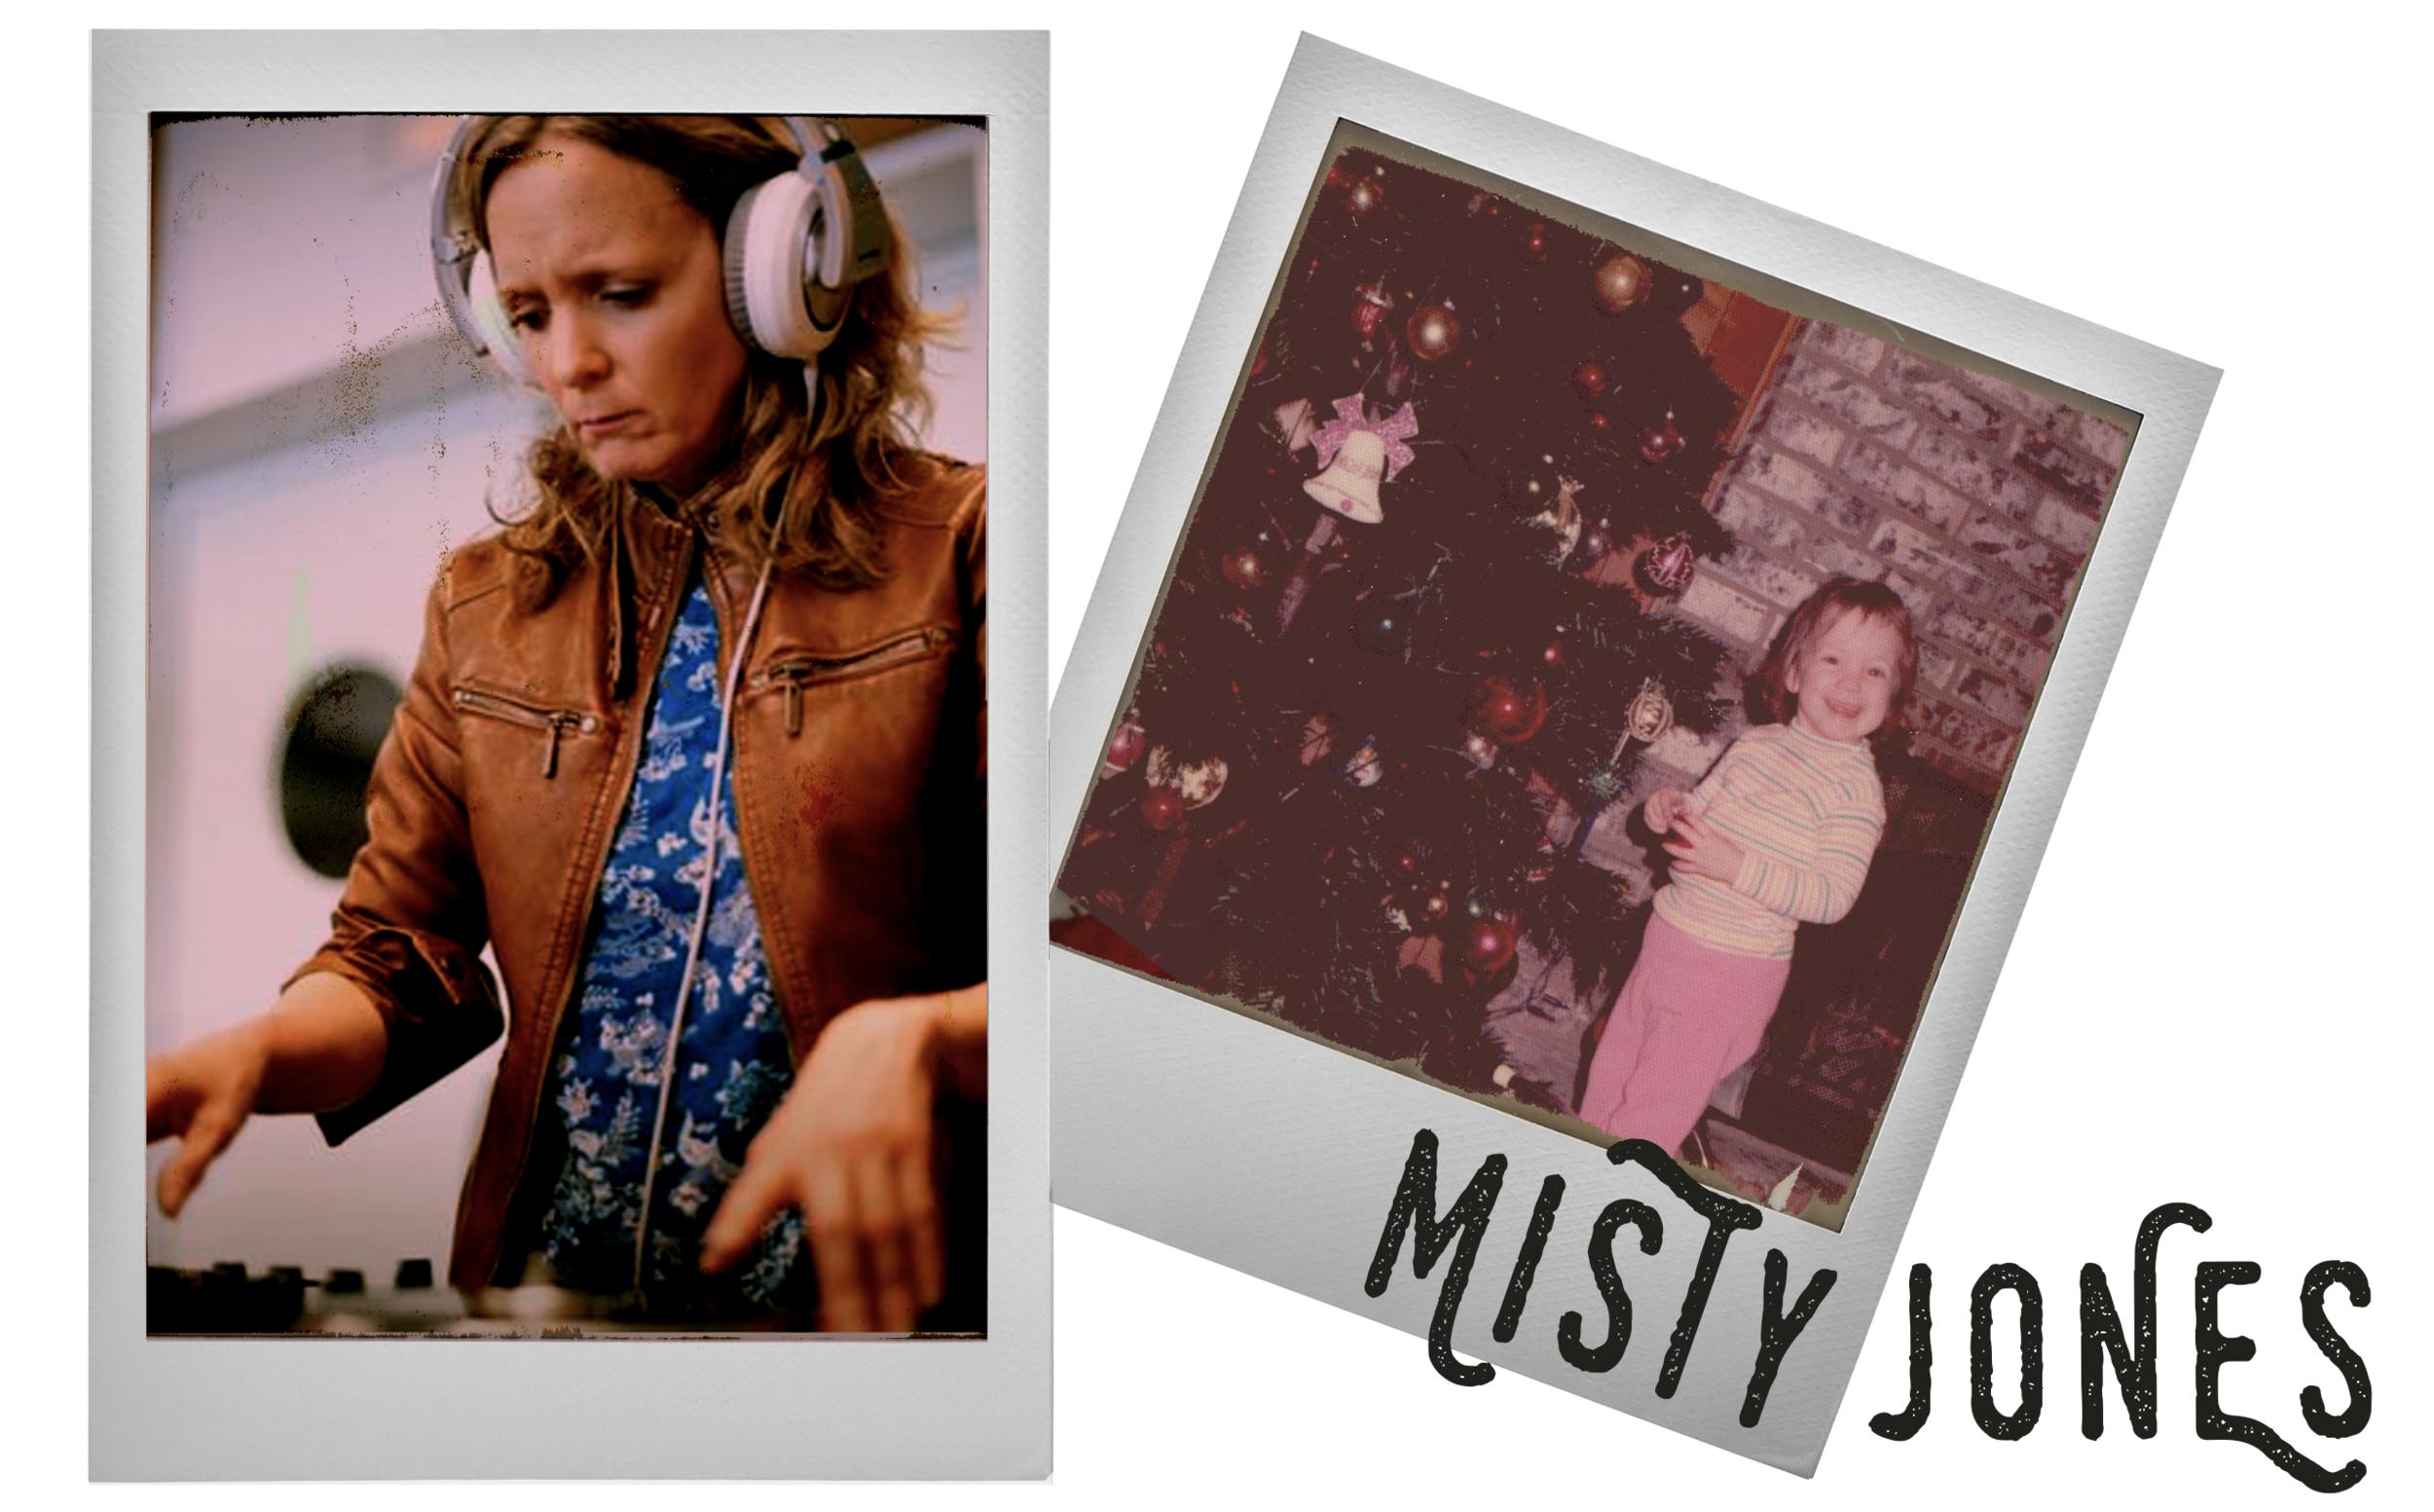 Misty Jones and The Nashville Treehouse